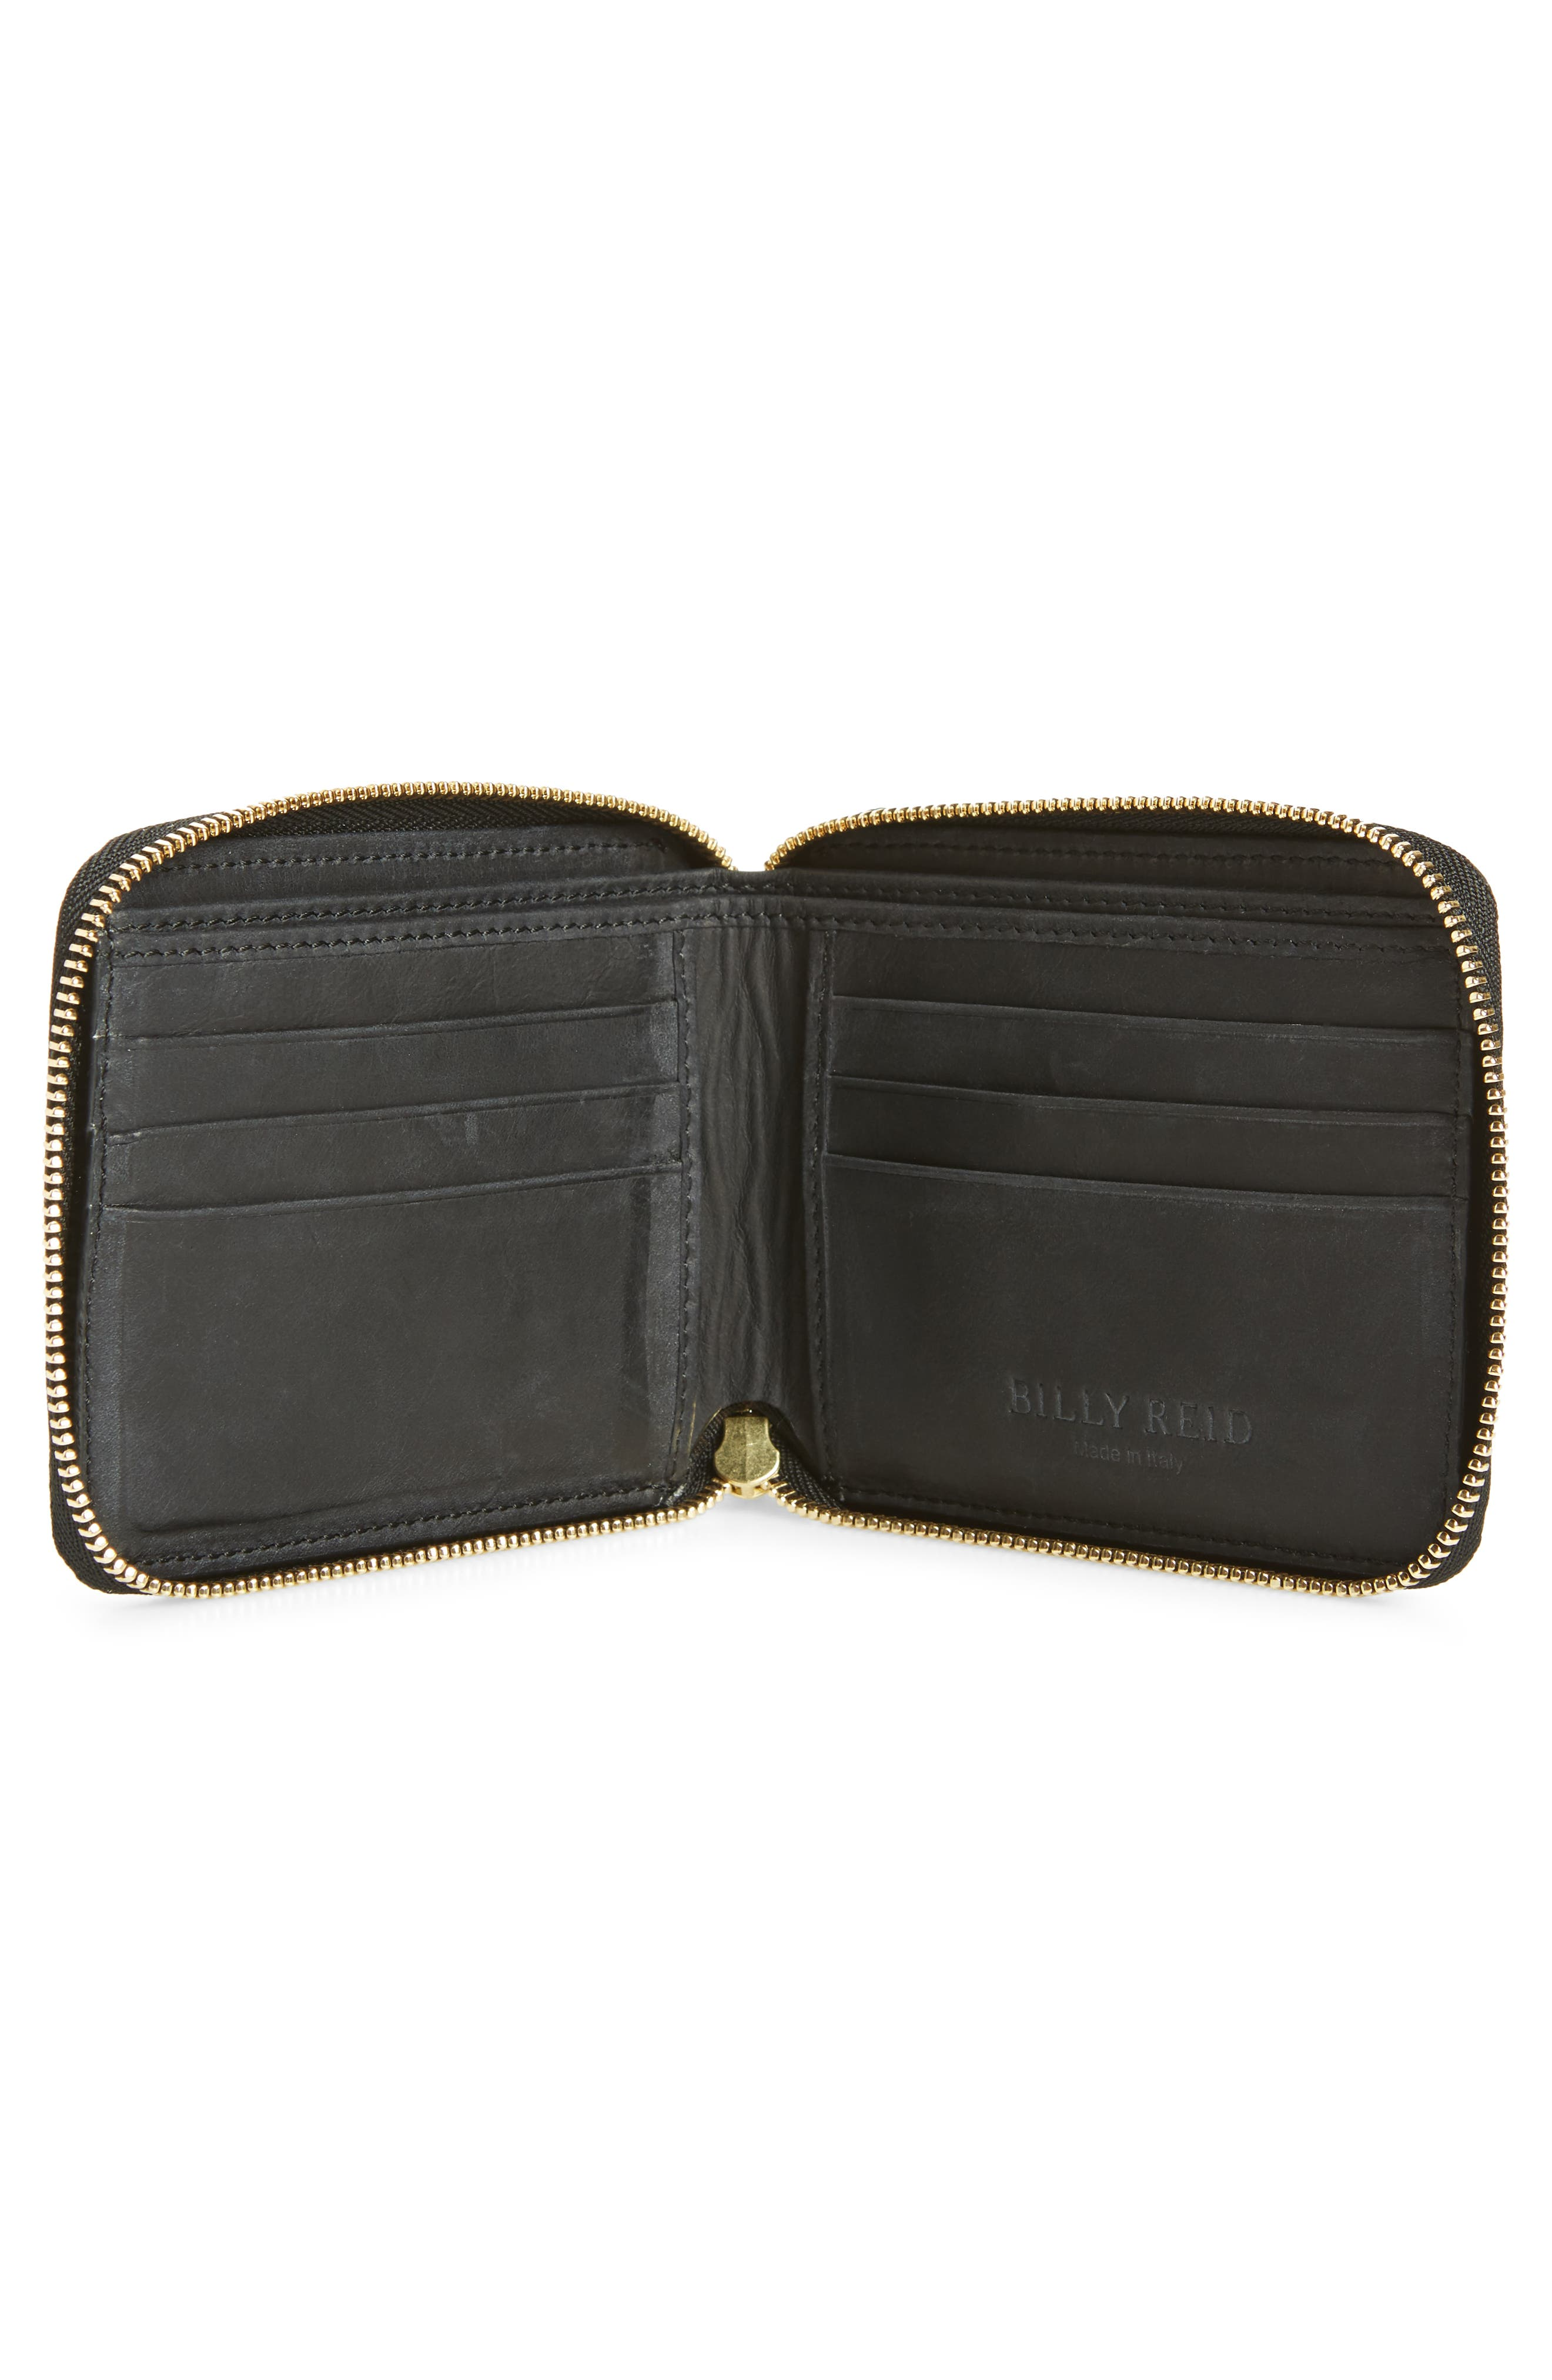 Leather Zip Wallet,                             Alternate thumbnail 2, color,                             Black